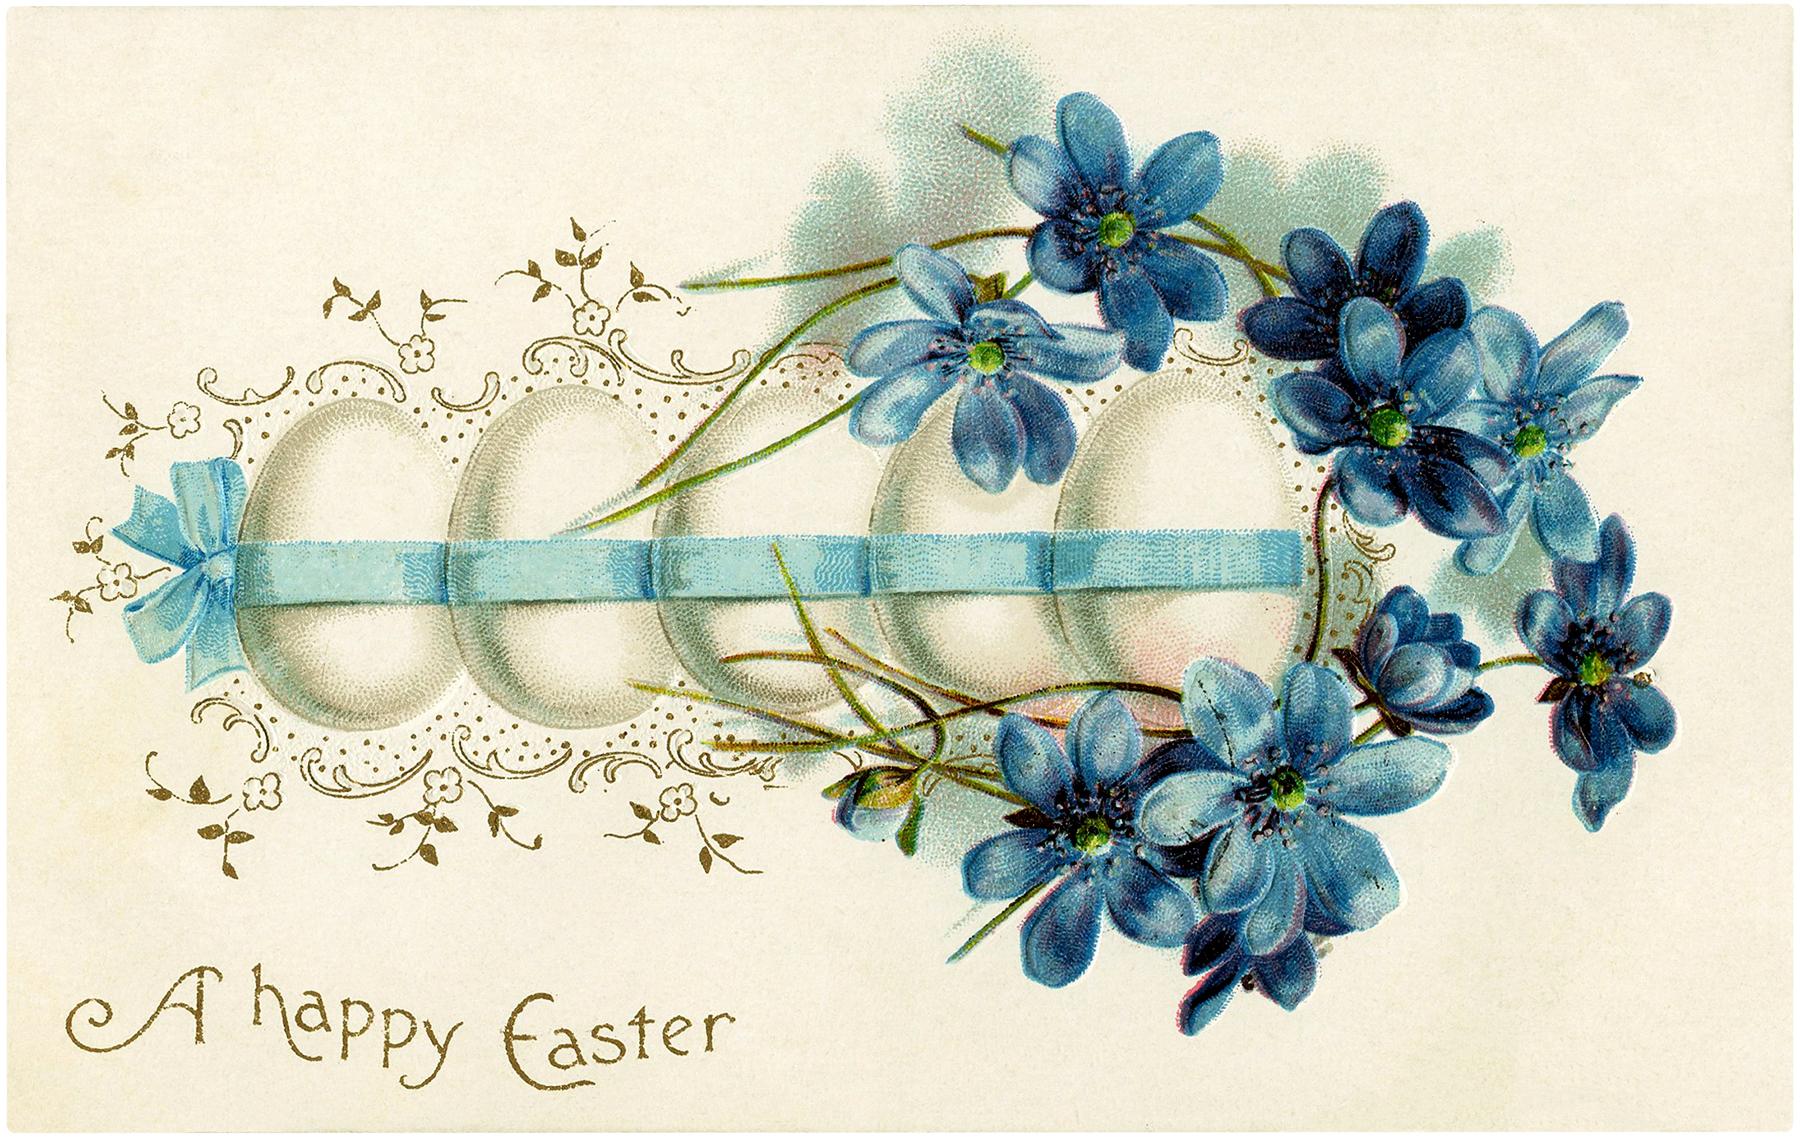 Vintage Pretty Easter Eggs Image